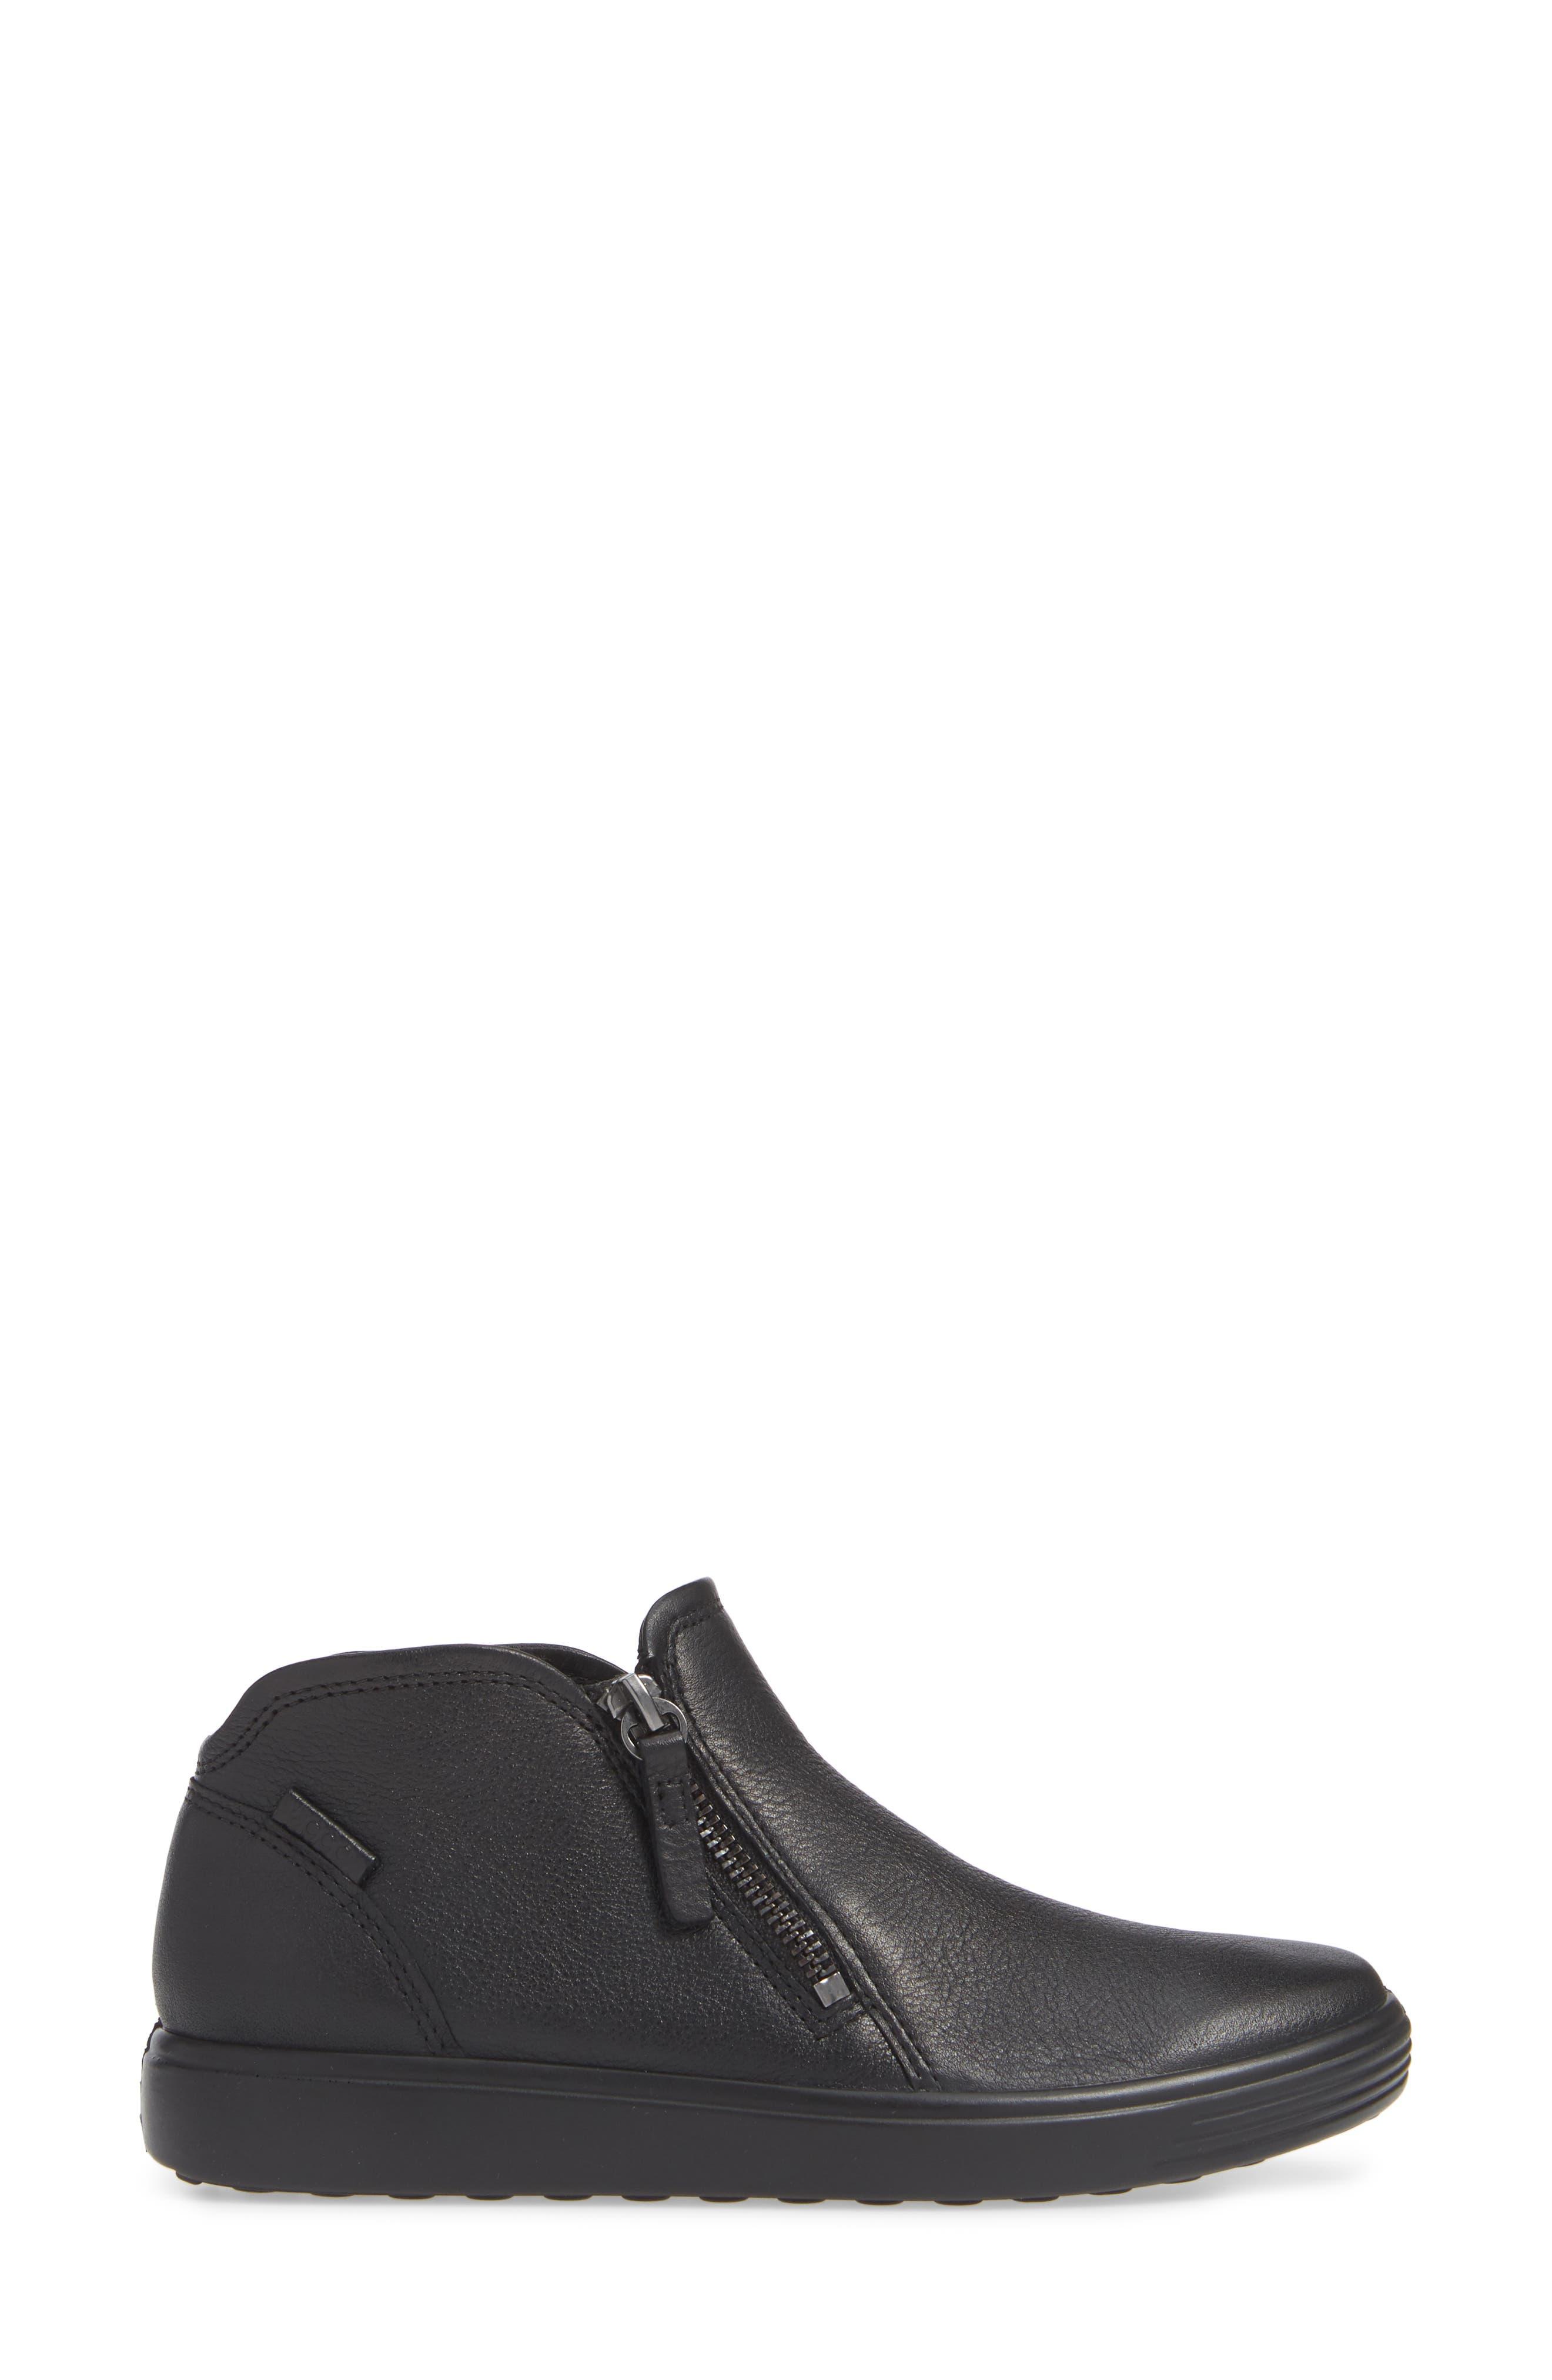 Soft 7 Mid Top Sneaker,                             Alternate thumbnail 3, color,                             BLACK/ BLACK LEATHER